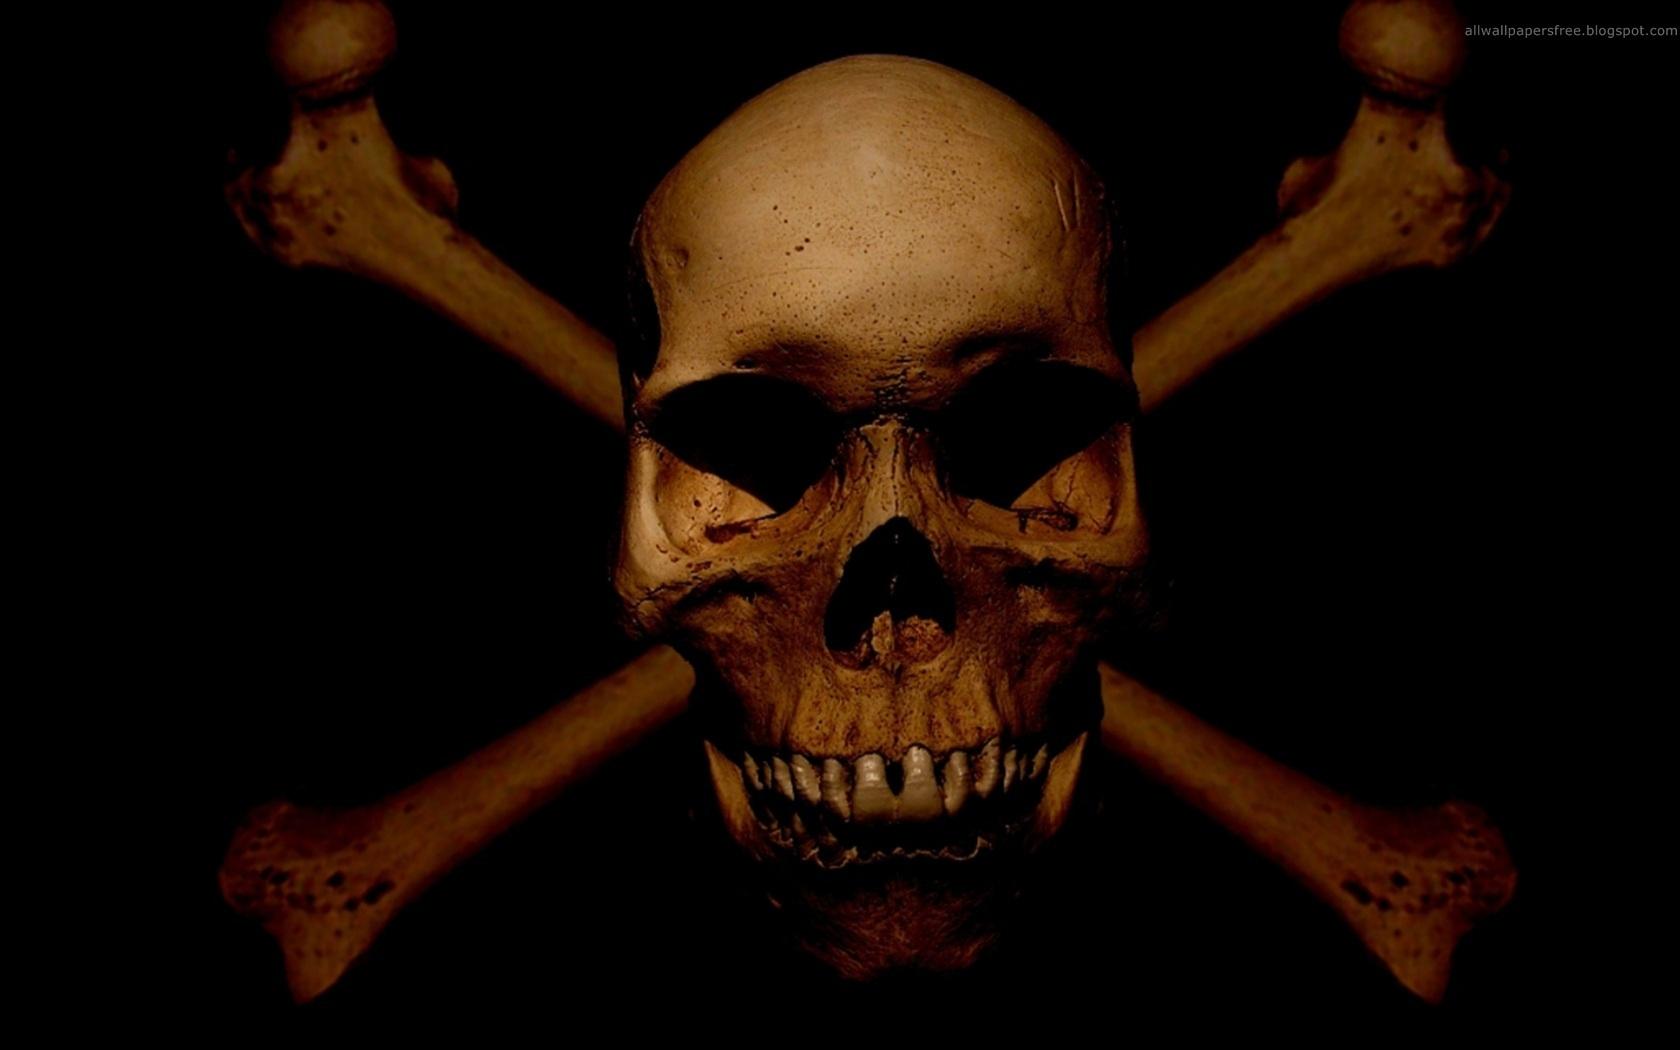 Skull and Bones wallpaper   ForWallpapercom 1680x1050